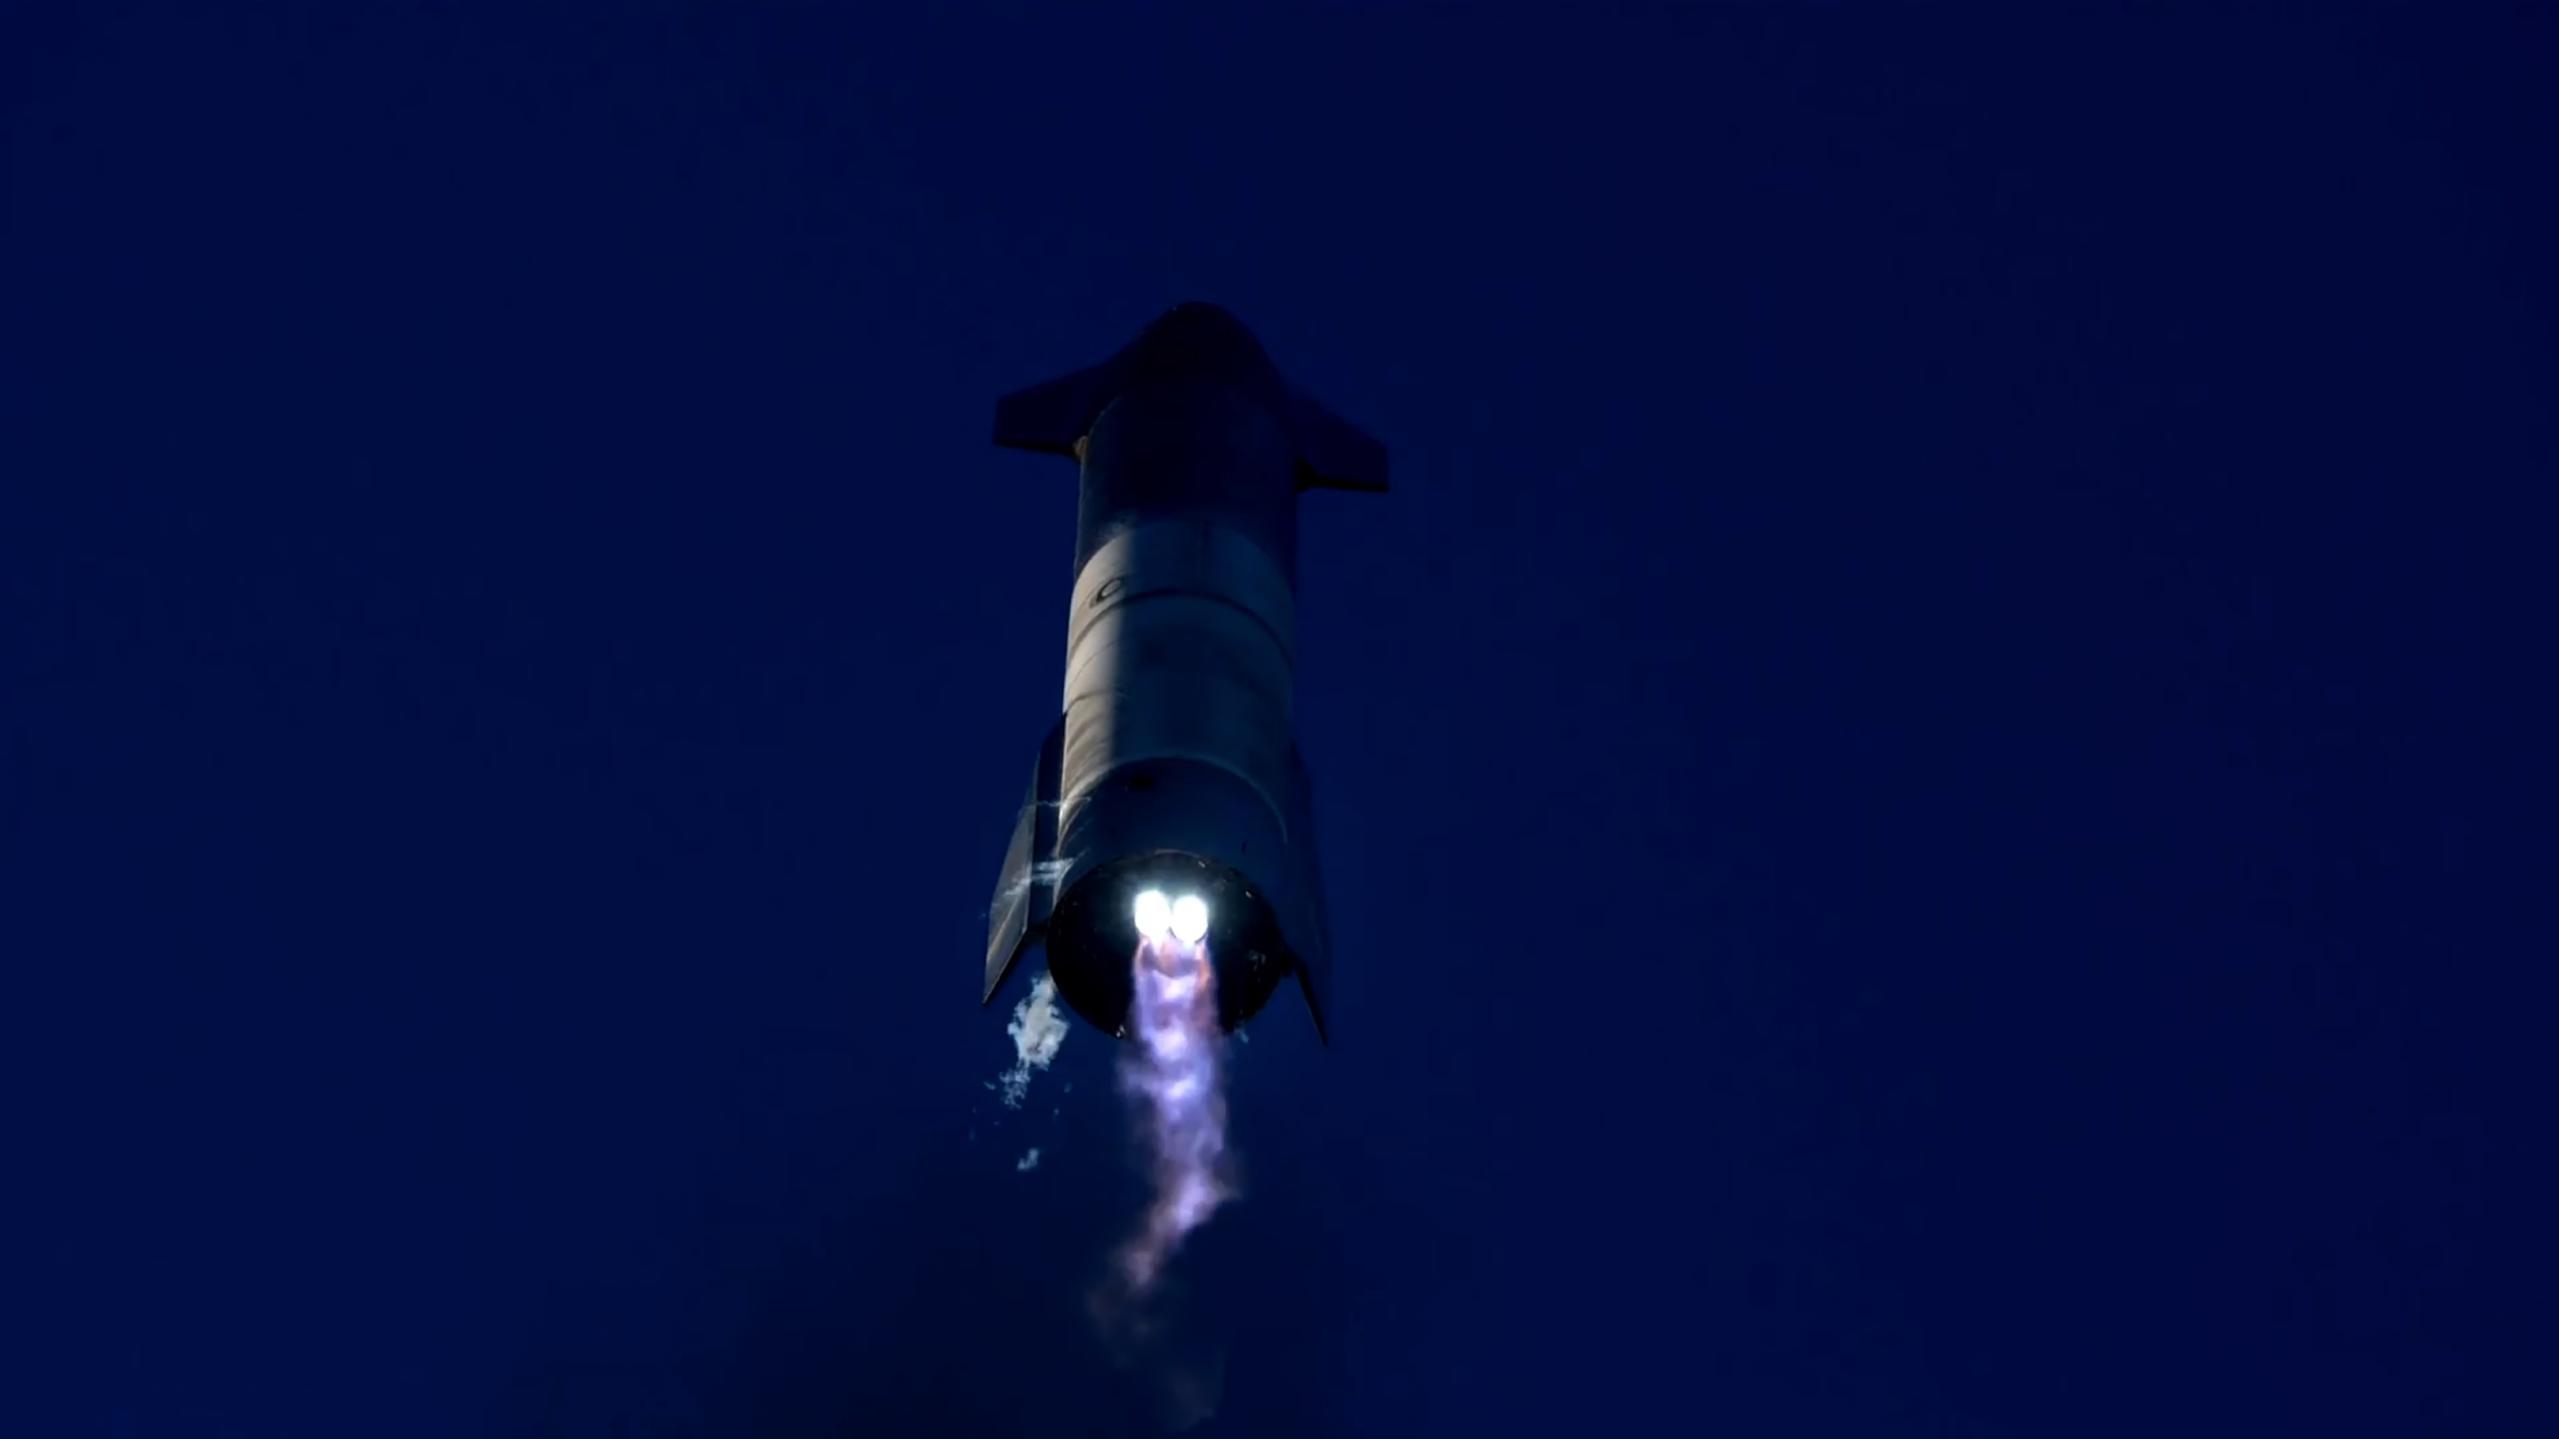 Starship SN8 launch recap 120920 (SpaceX) flip 3 (c)